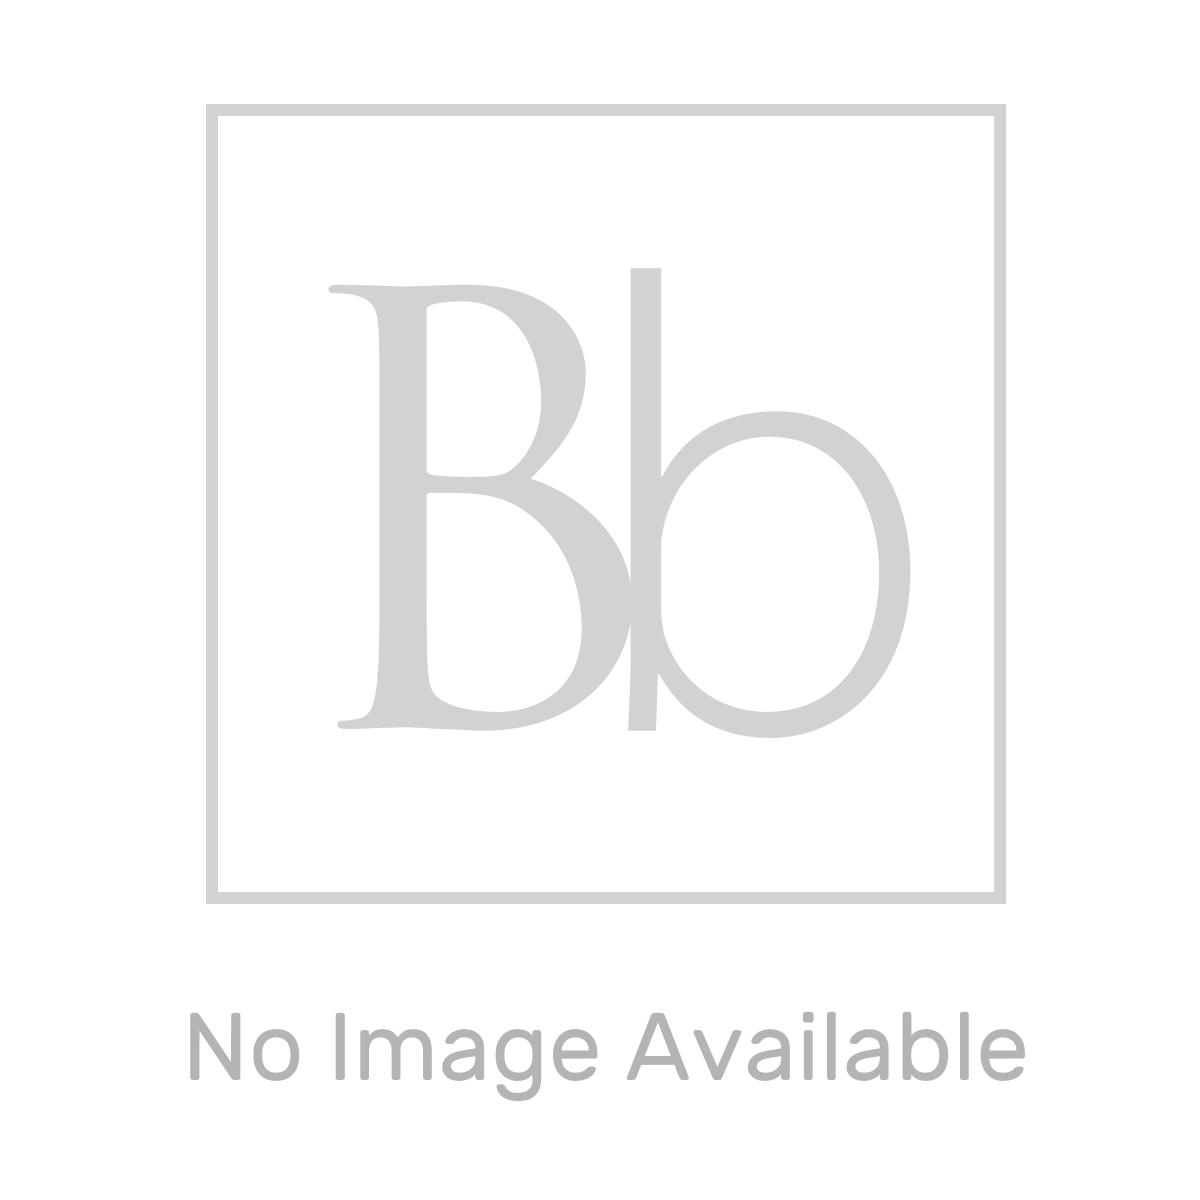 Aquadart White Slate Shower Tray 1700 x 900 Overhead